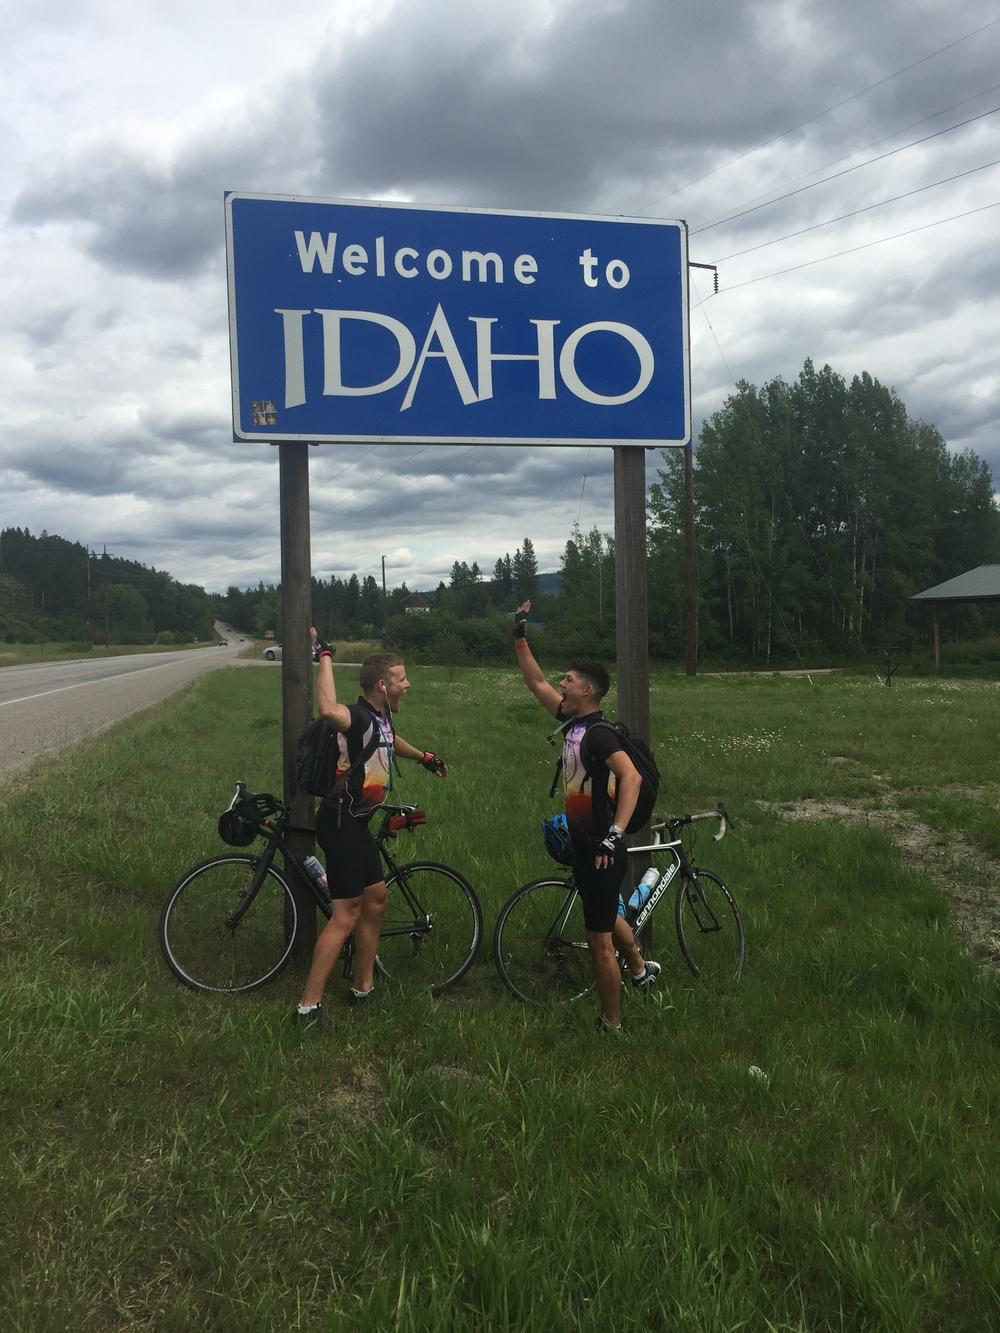 At the border into Idaho